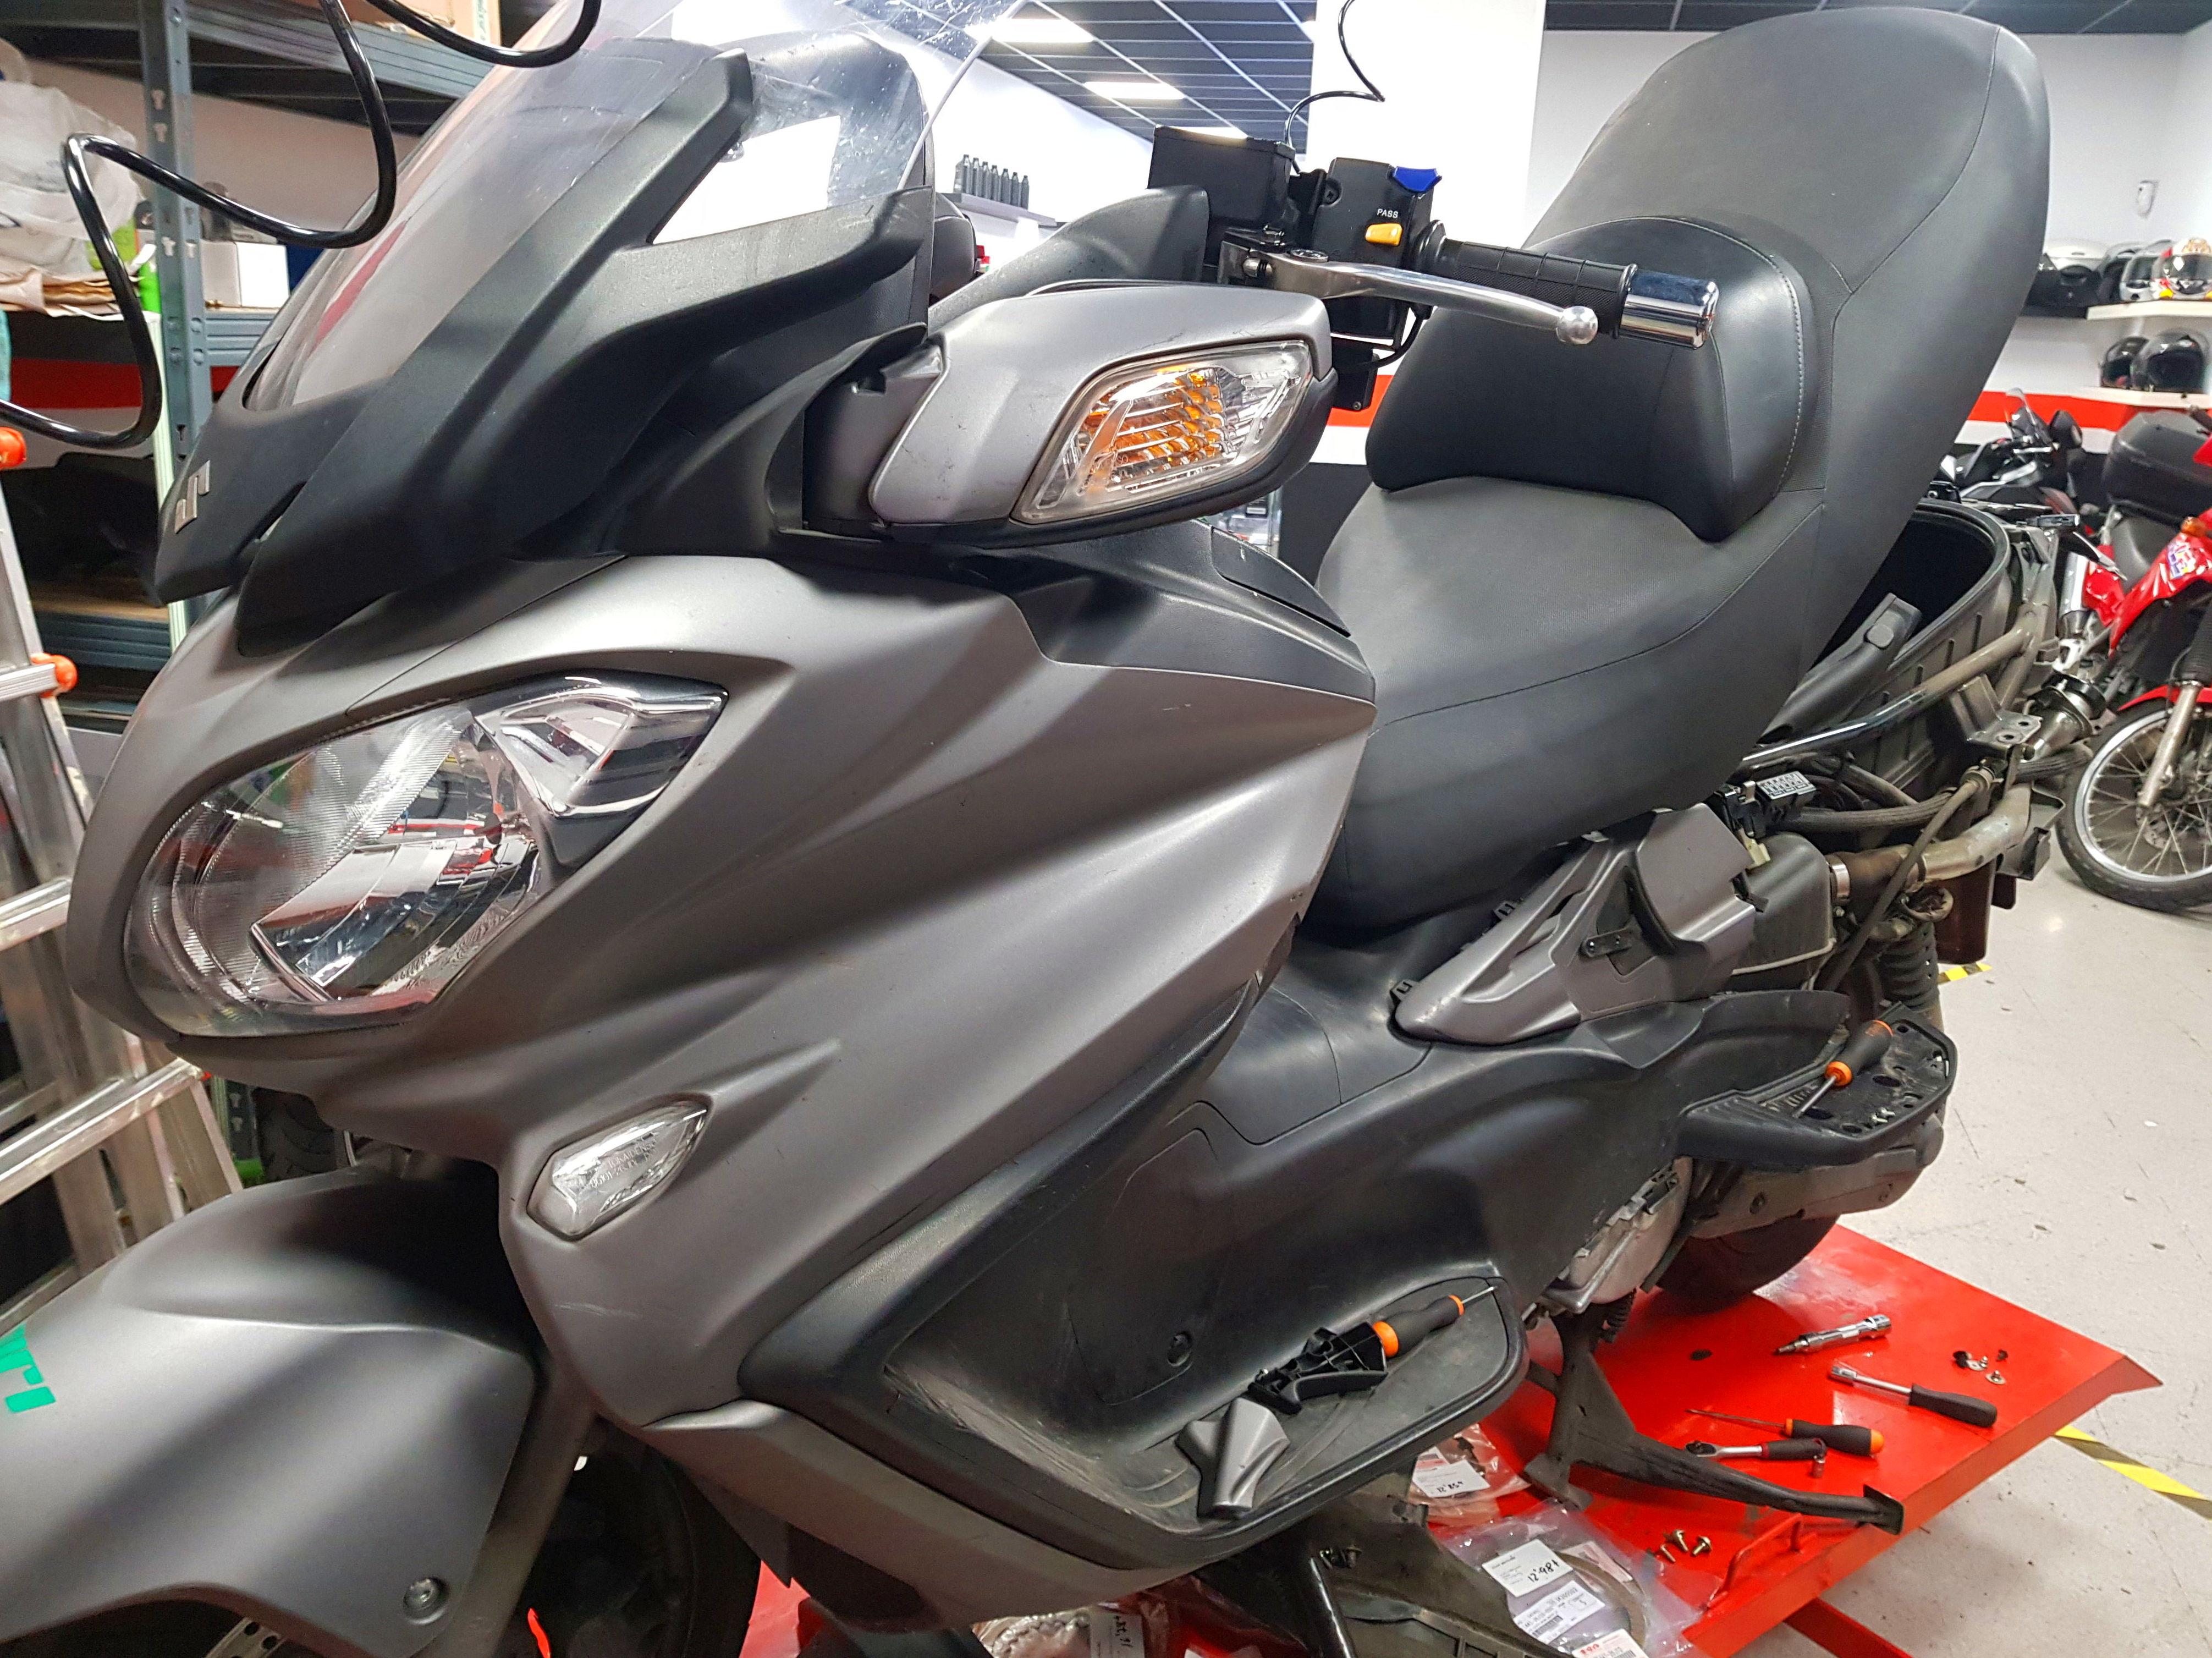 Foto 15 de Taller de motos multimarca en Mataró   Motos Iluro